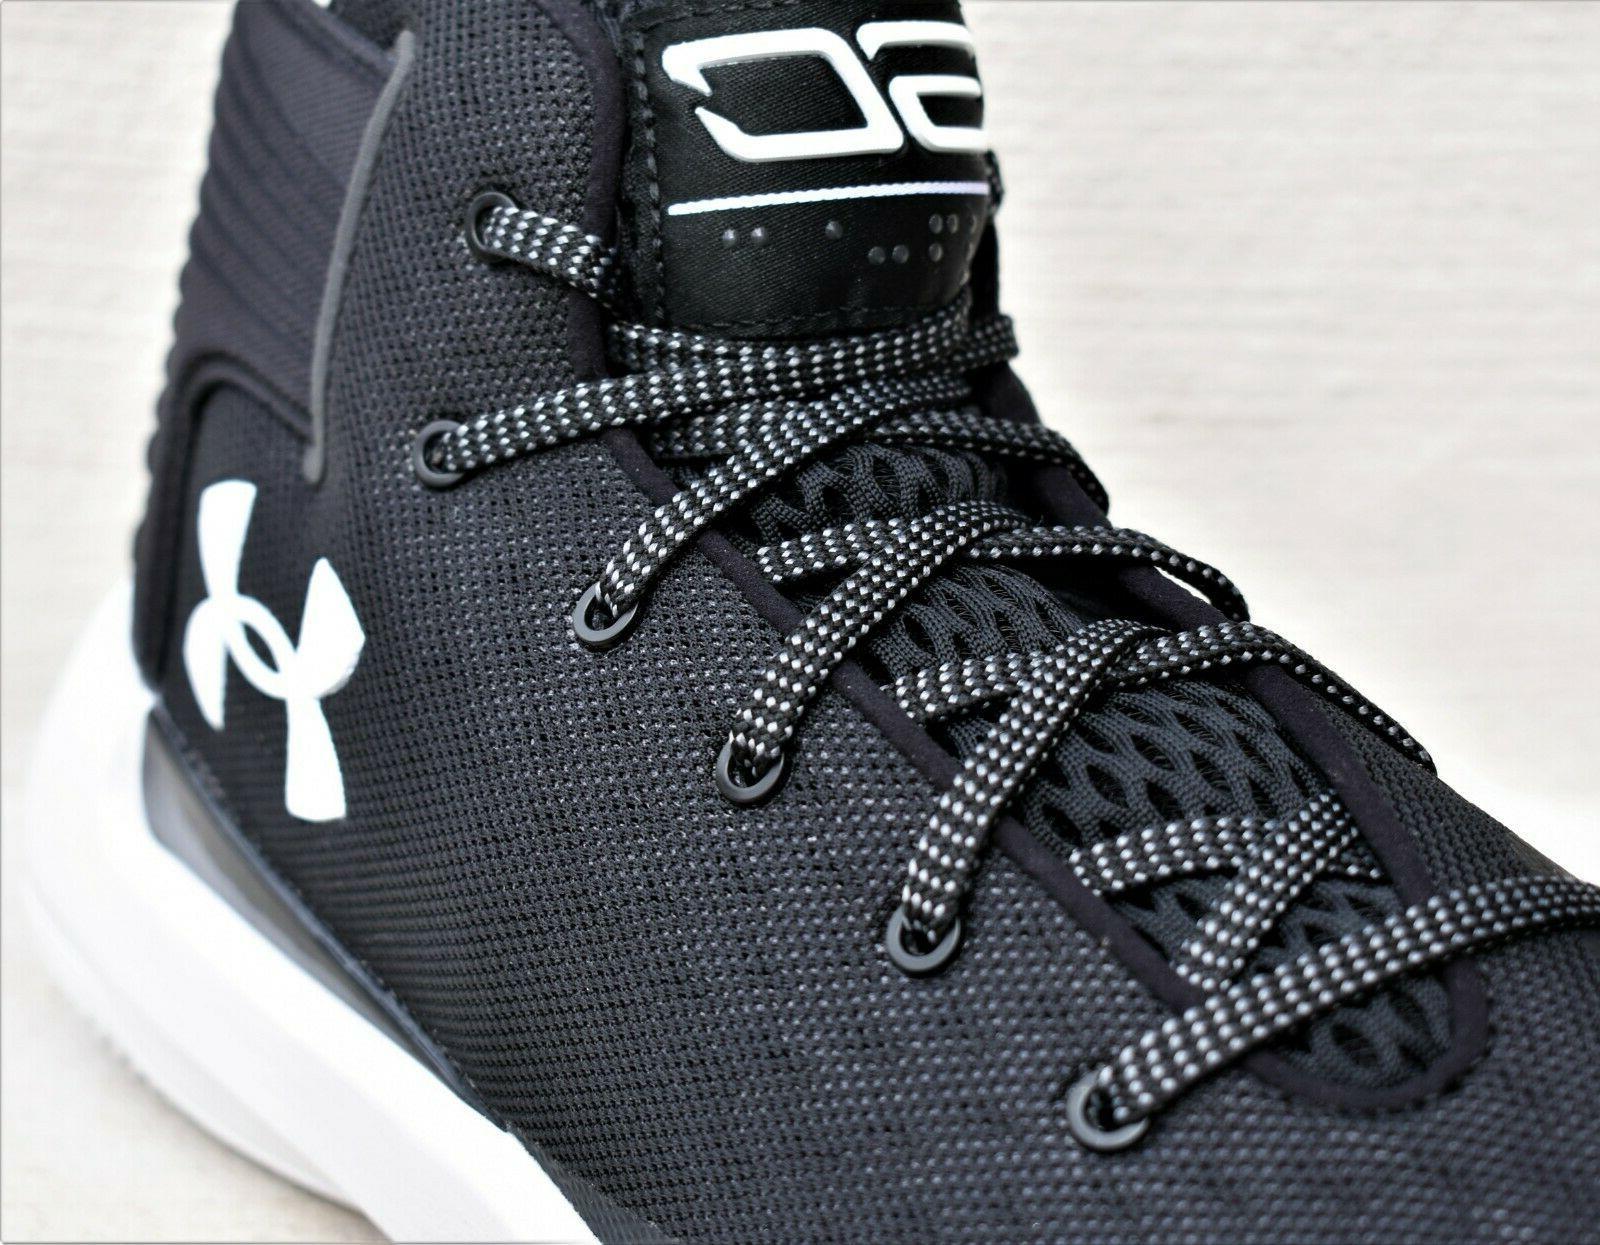 UNDER ARMOUR SC 3ZERO - New UA Stephen Curry Basketball Black